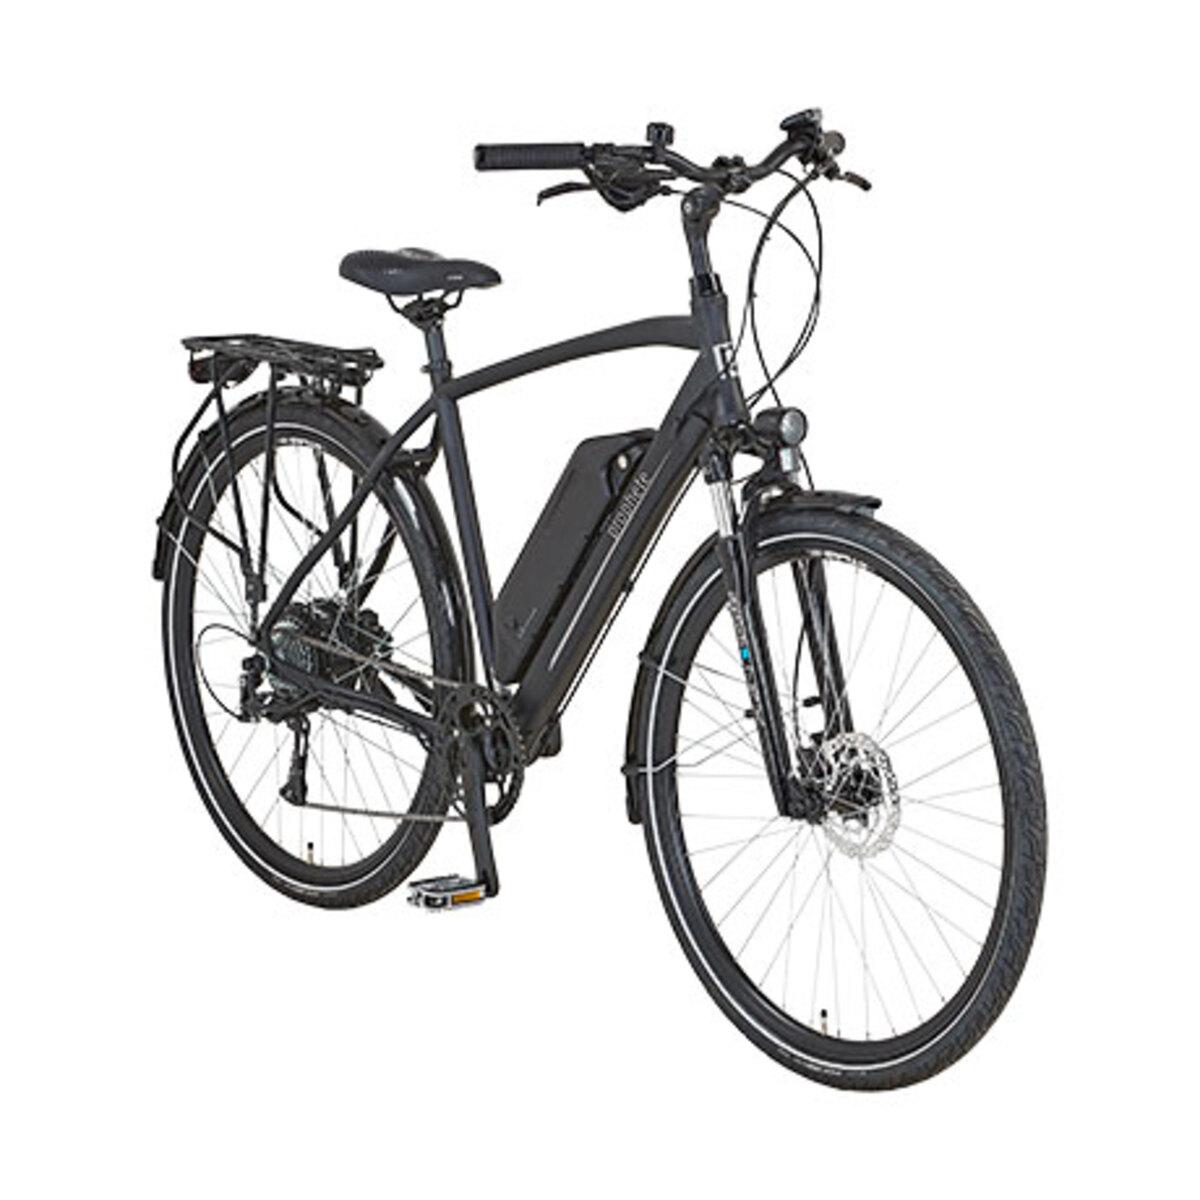 Bild 3 von Trekking-E-Bike Herren1